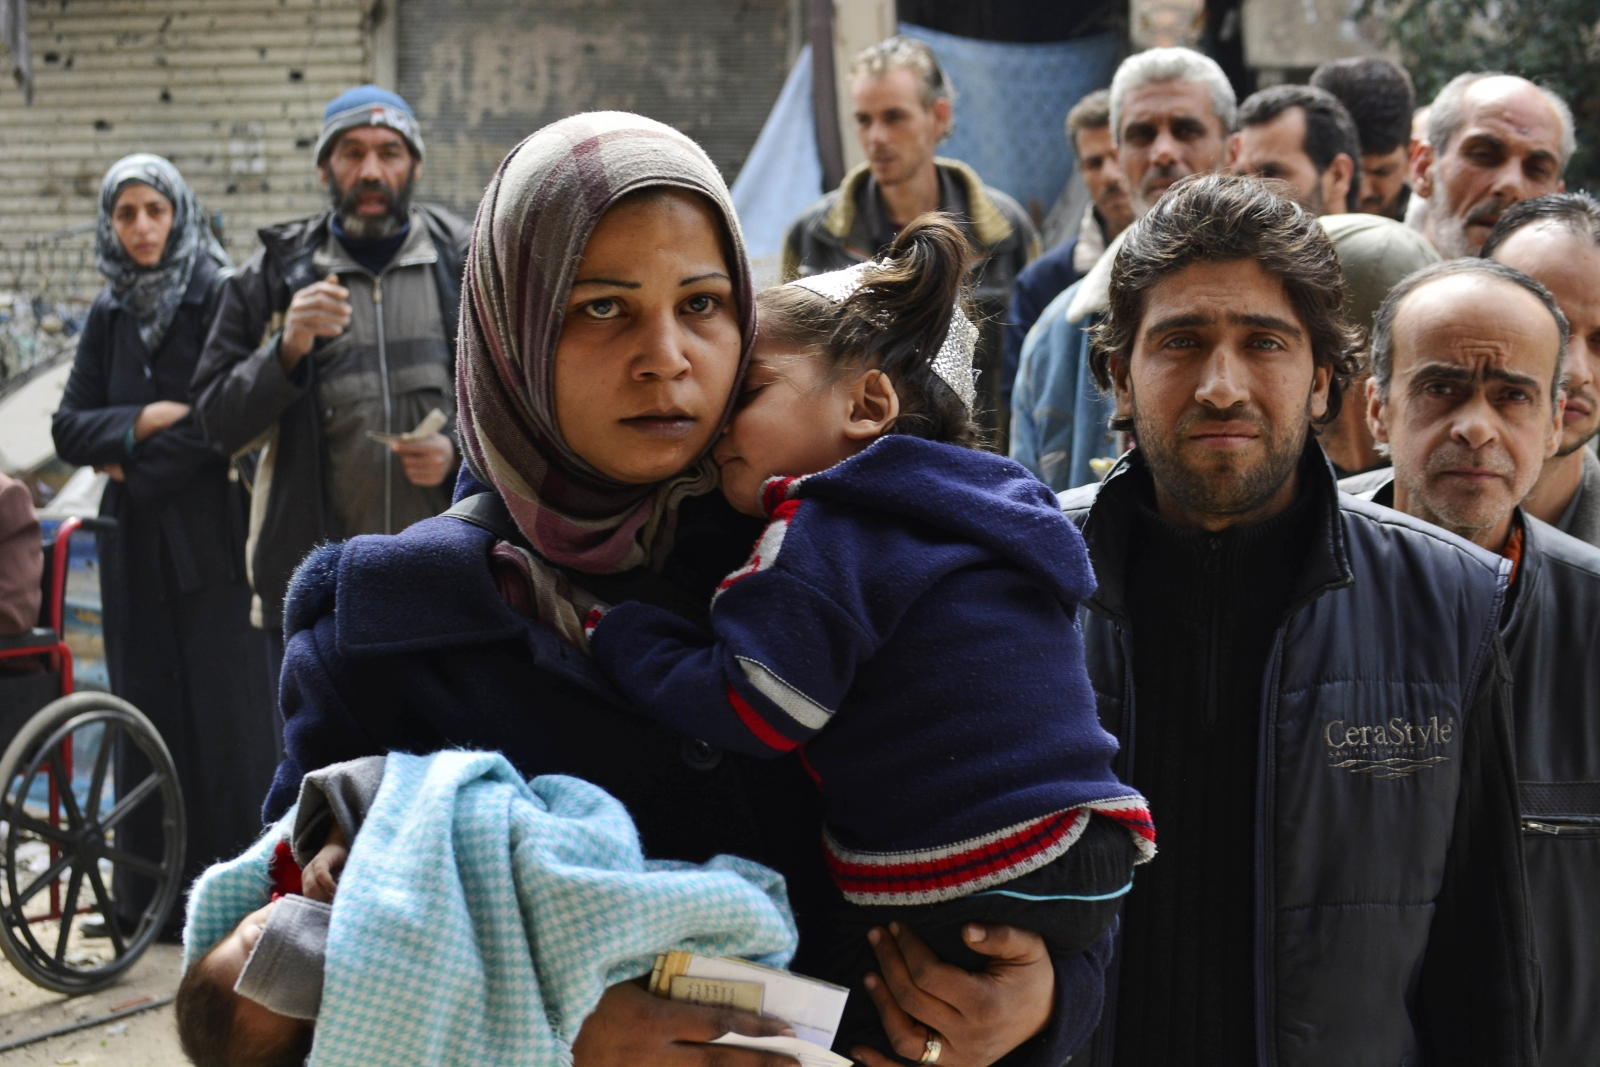 Palestinian refugee camp of Yarmouk